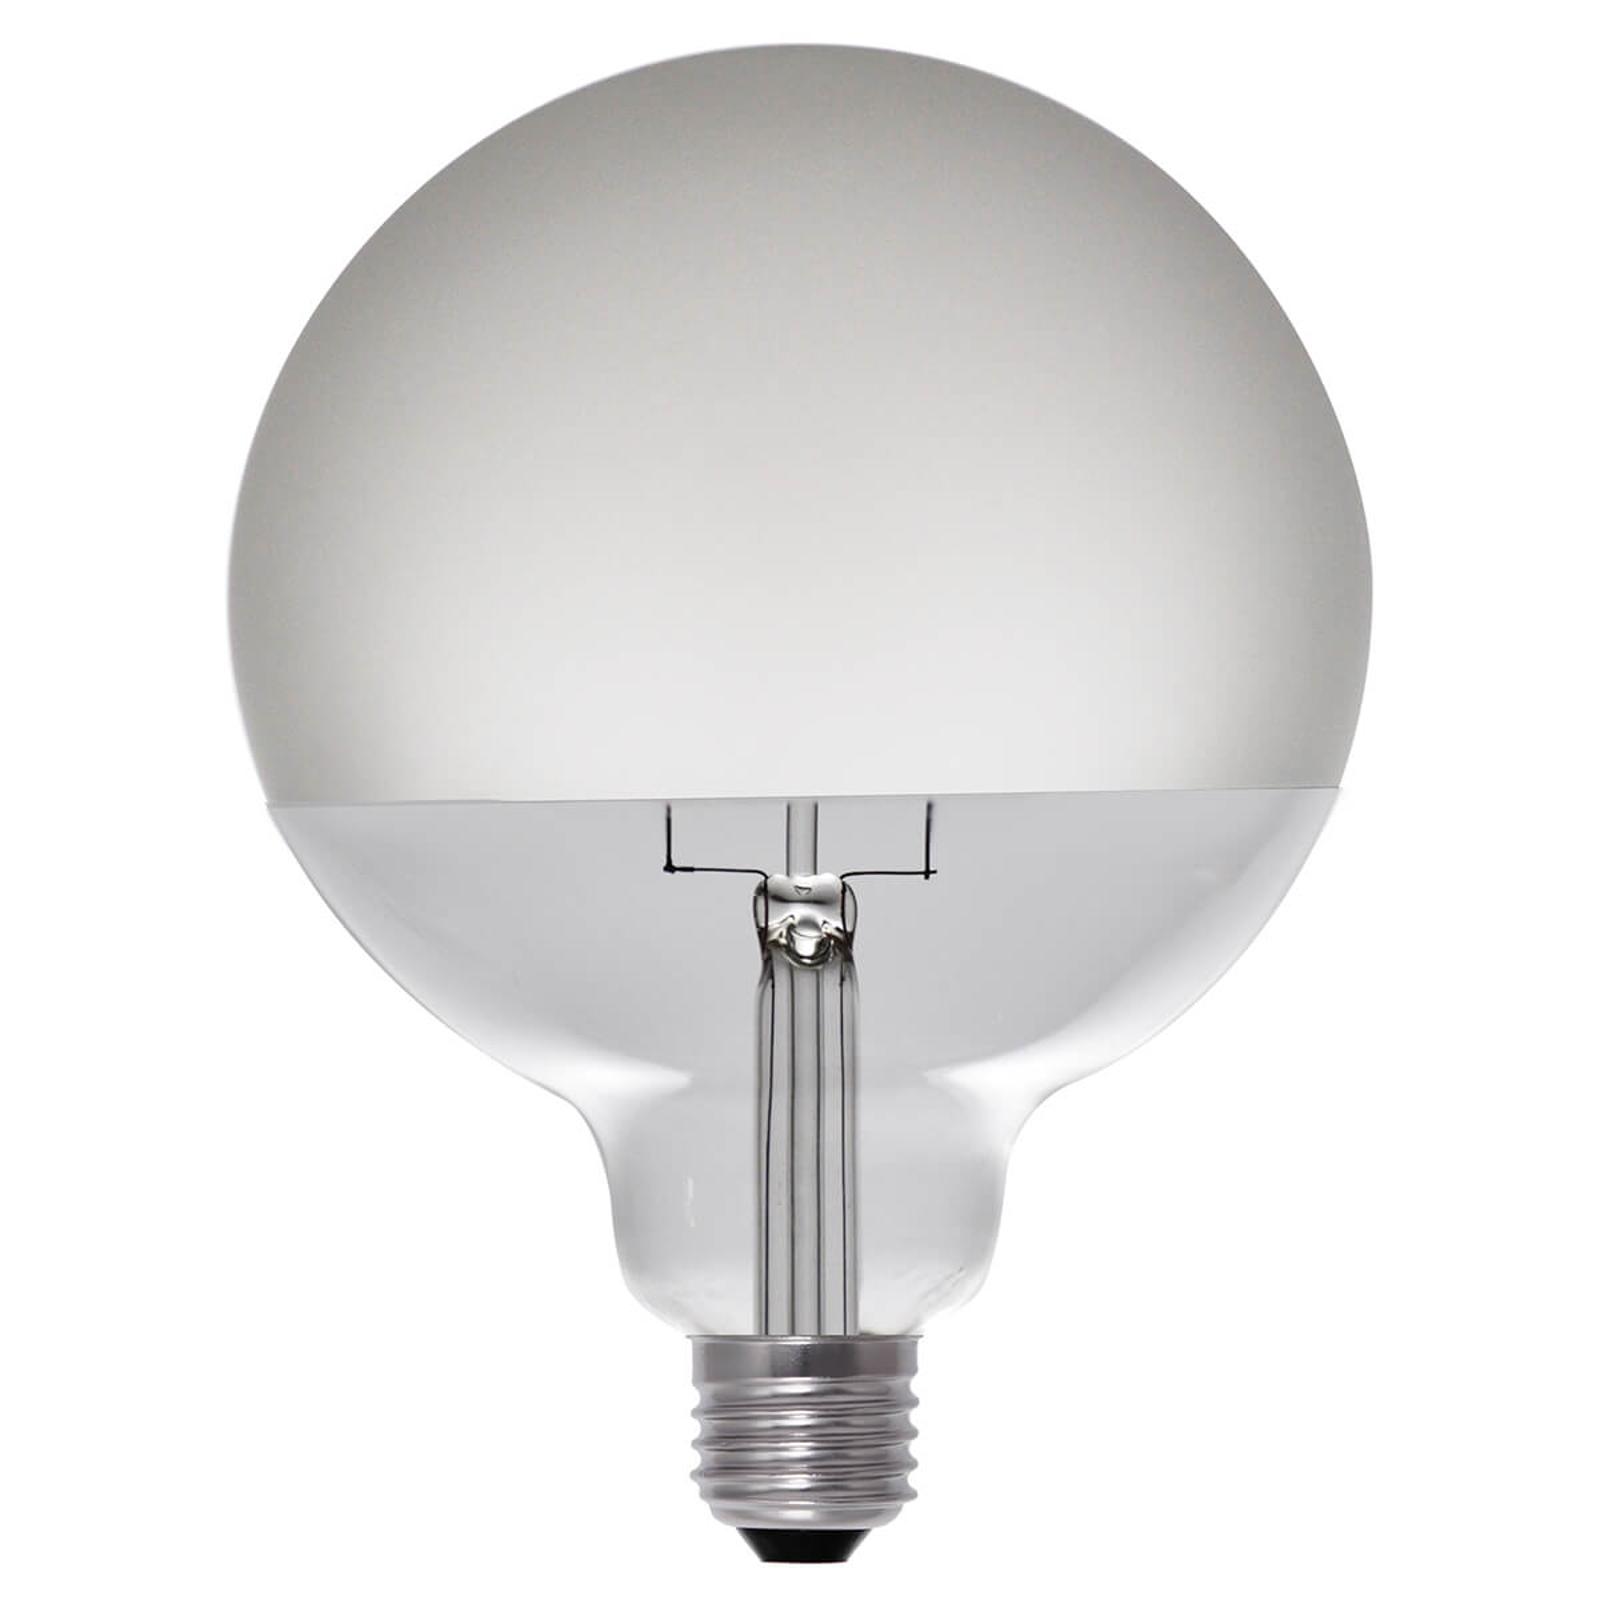 LED-Globelampe halbmatt E27 8W, warmweiß